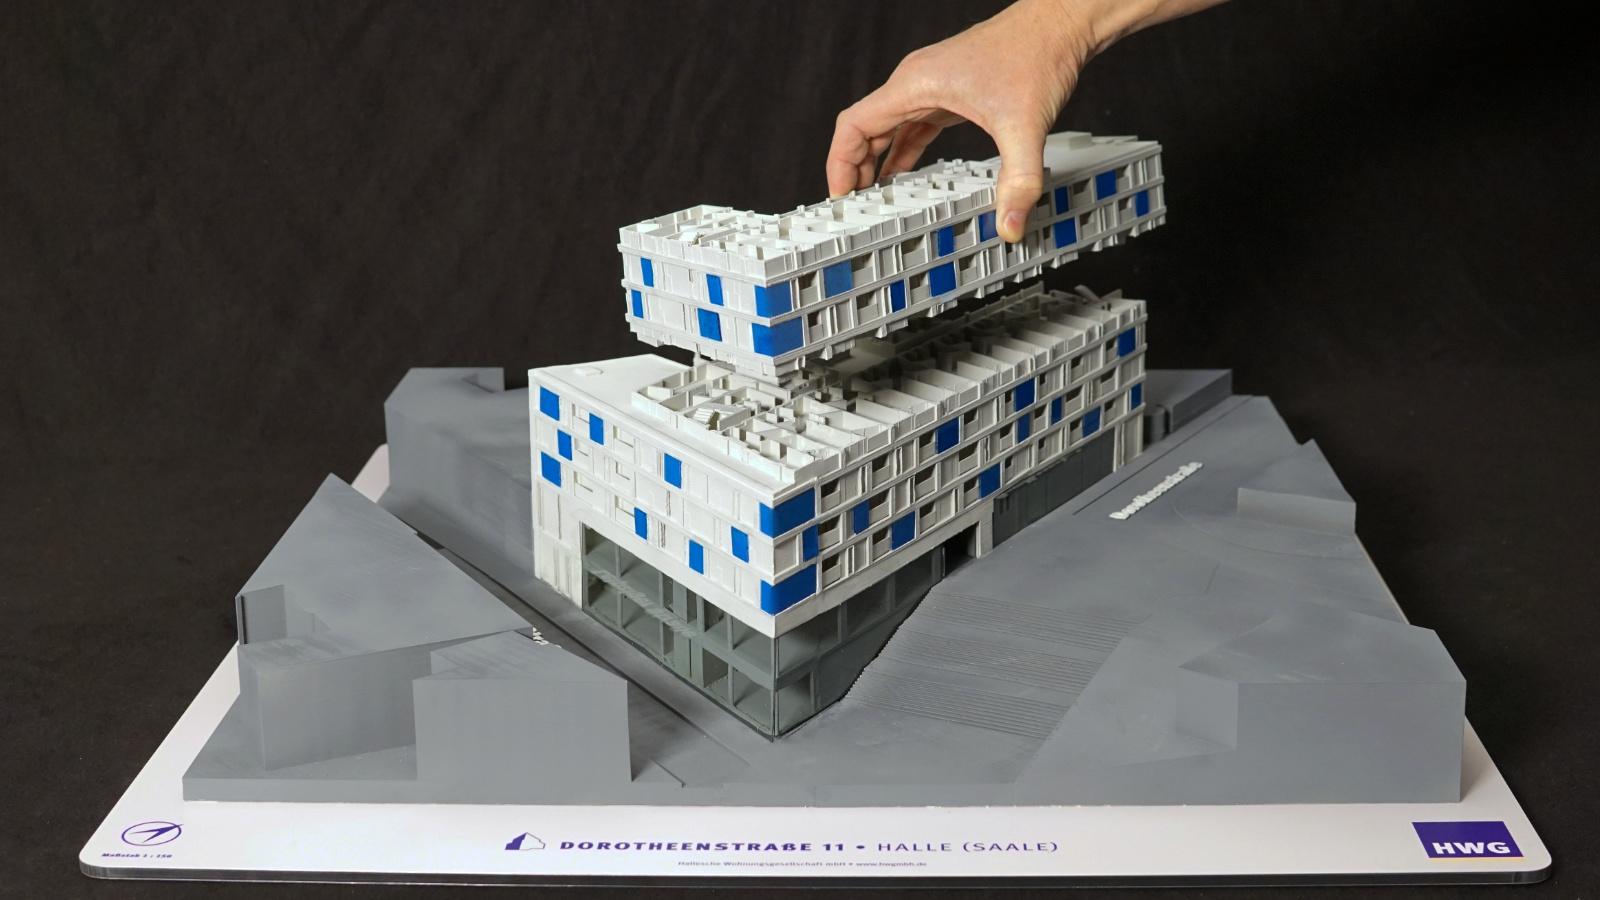 3D printed model in scale 1:150